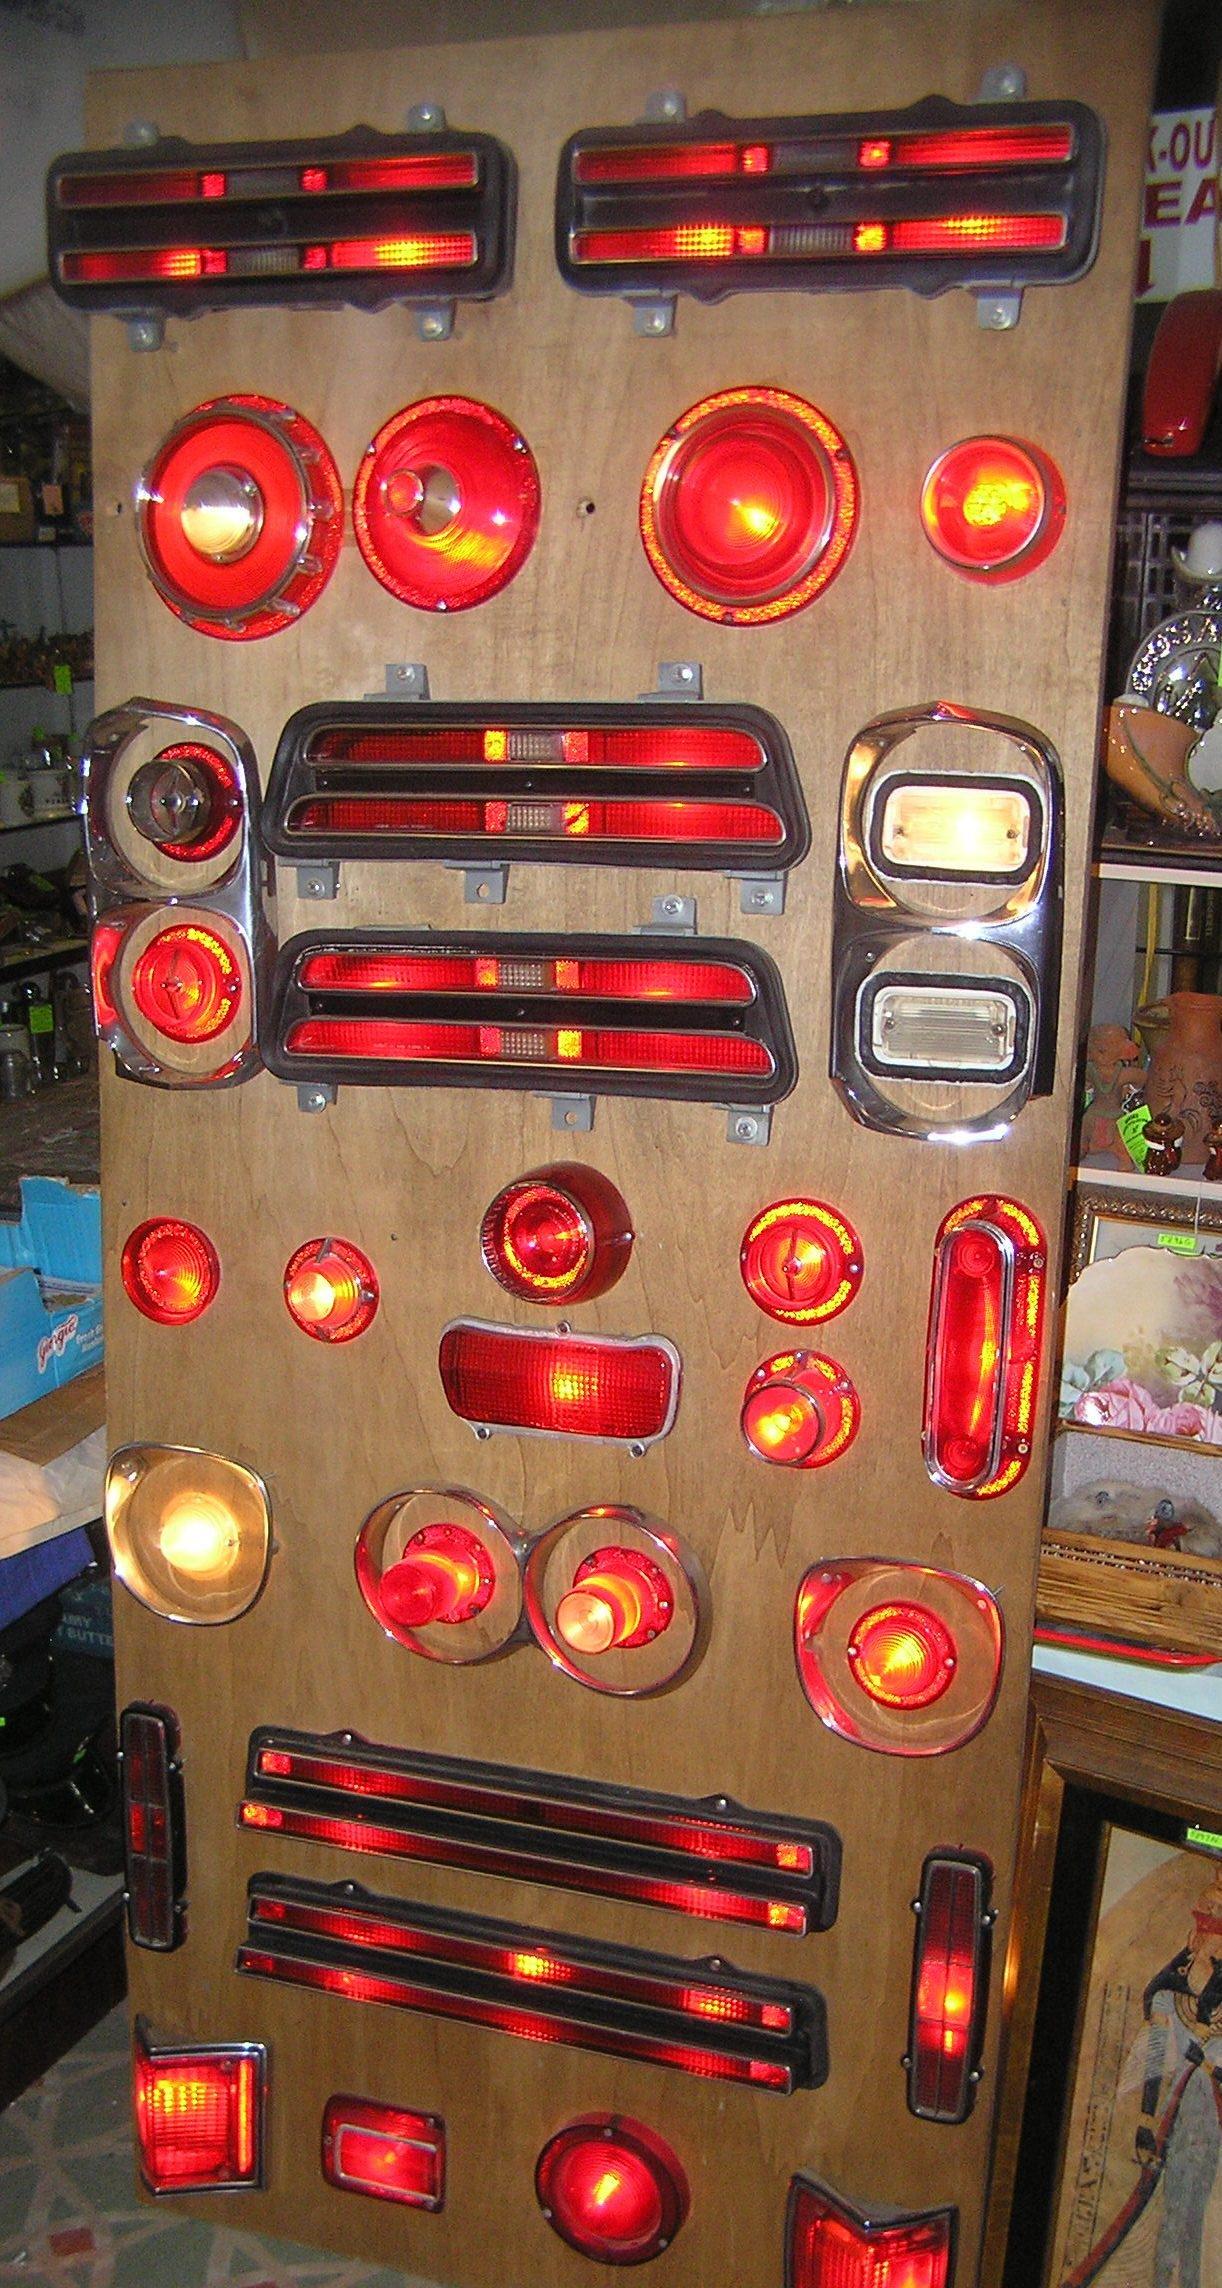 Vintage illuminated automotive light diorama display